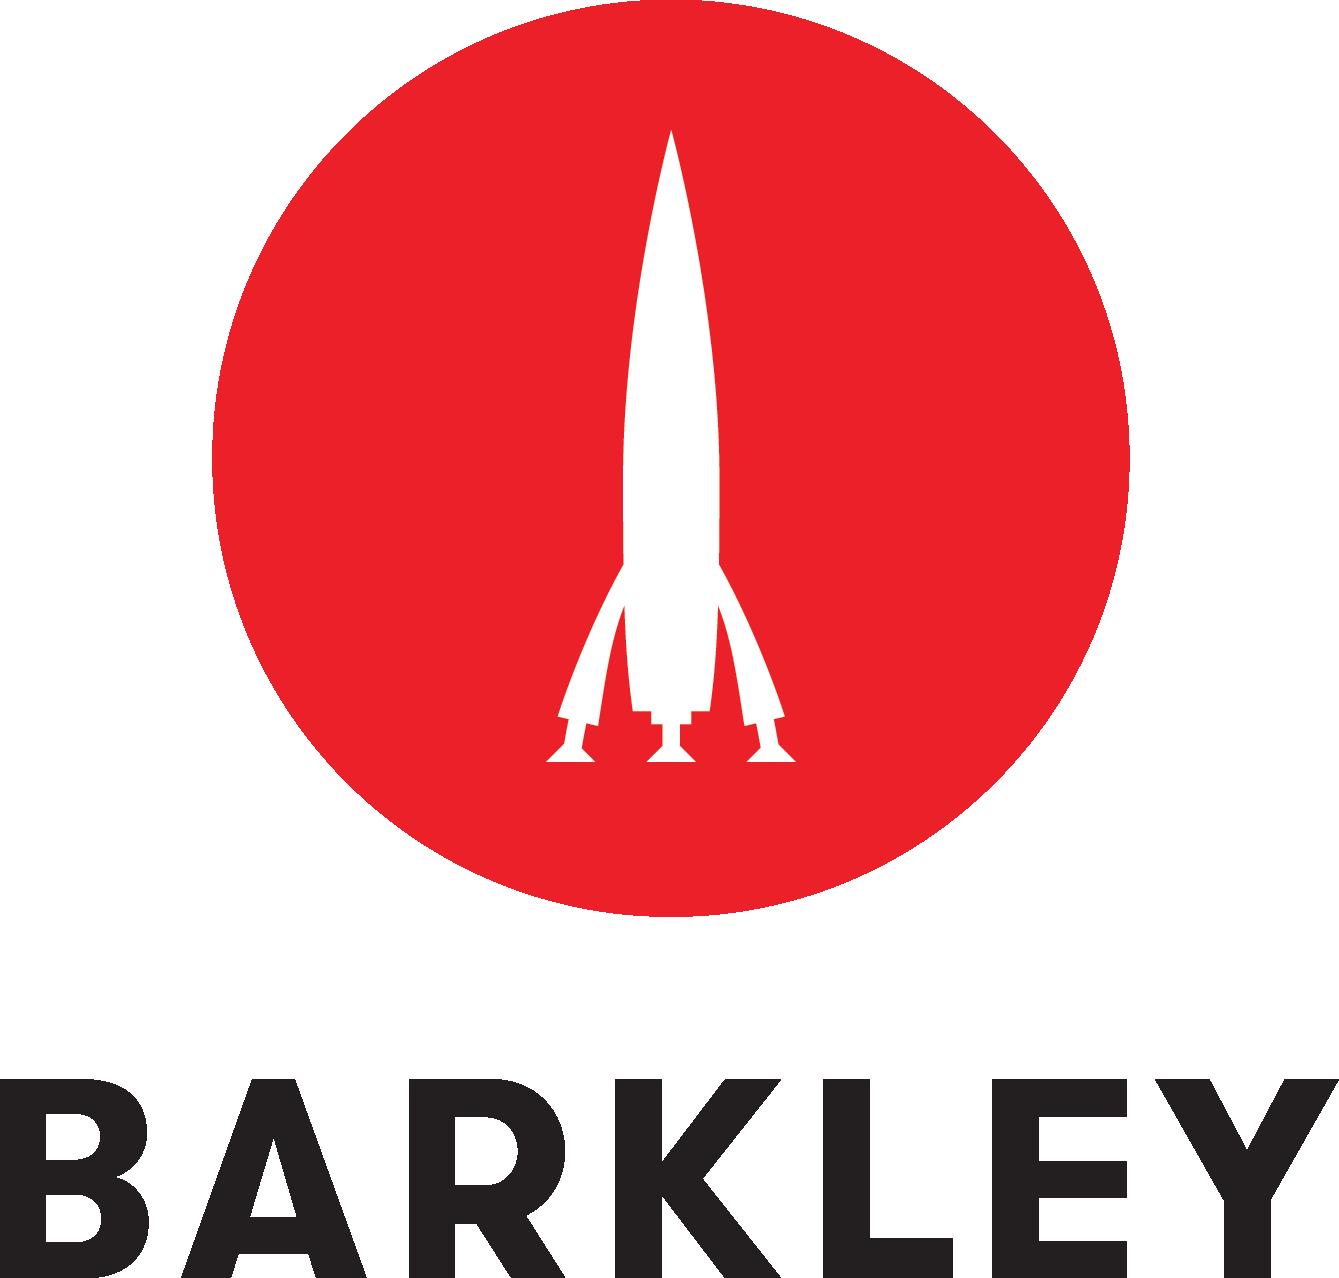 barkleylogo_vertical